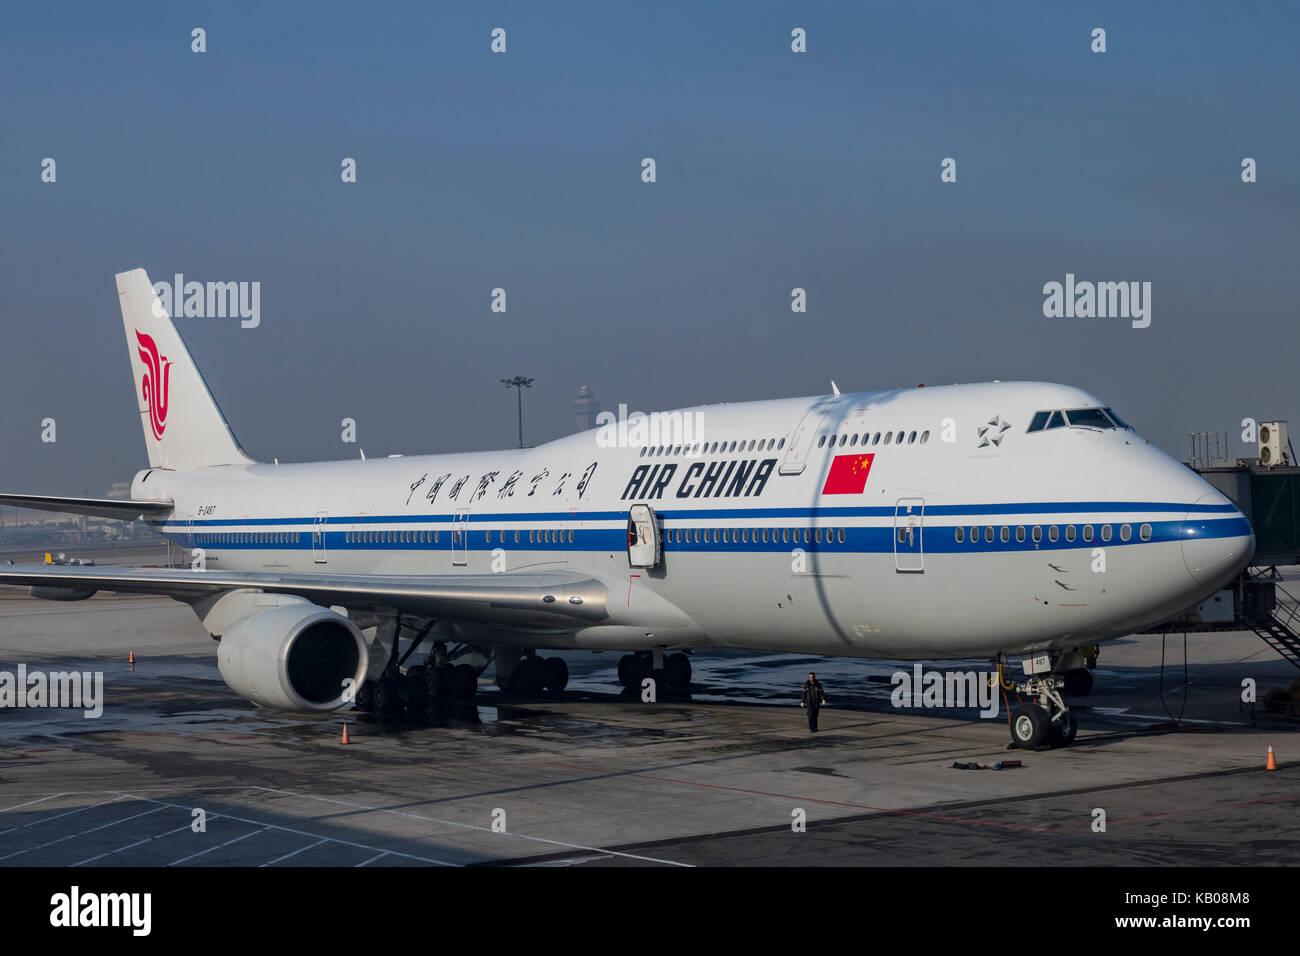 Peking, Jan 3: Air China von Peking - der internationale Flughafen in Peking, China Stockbild